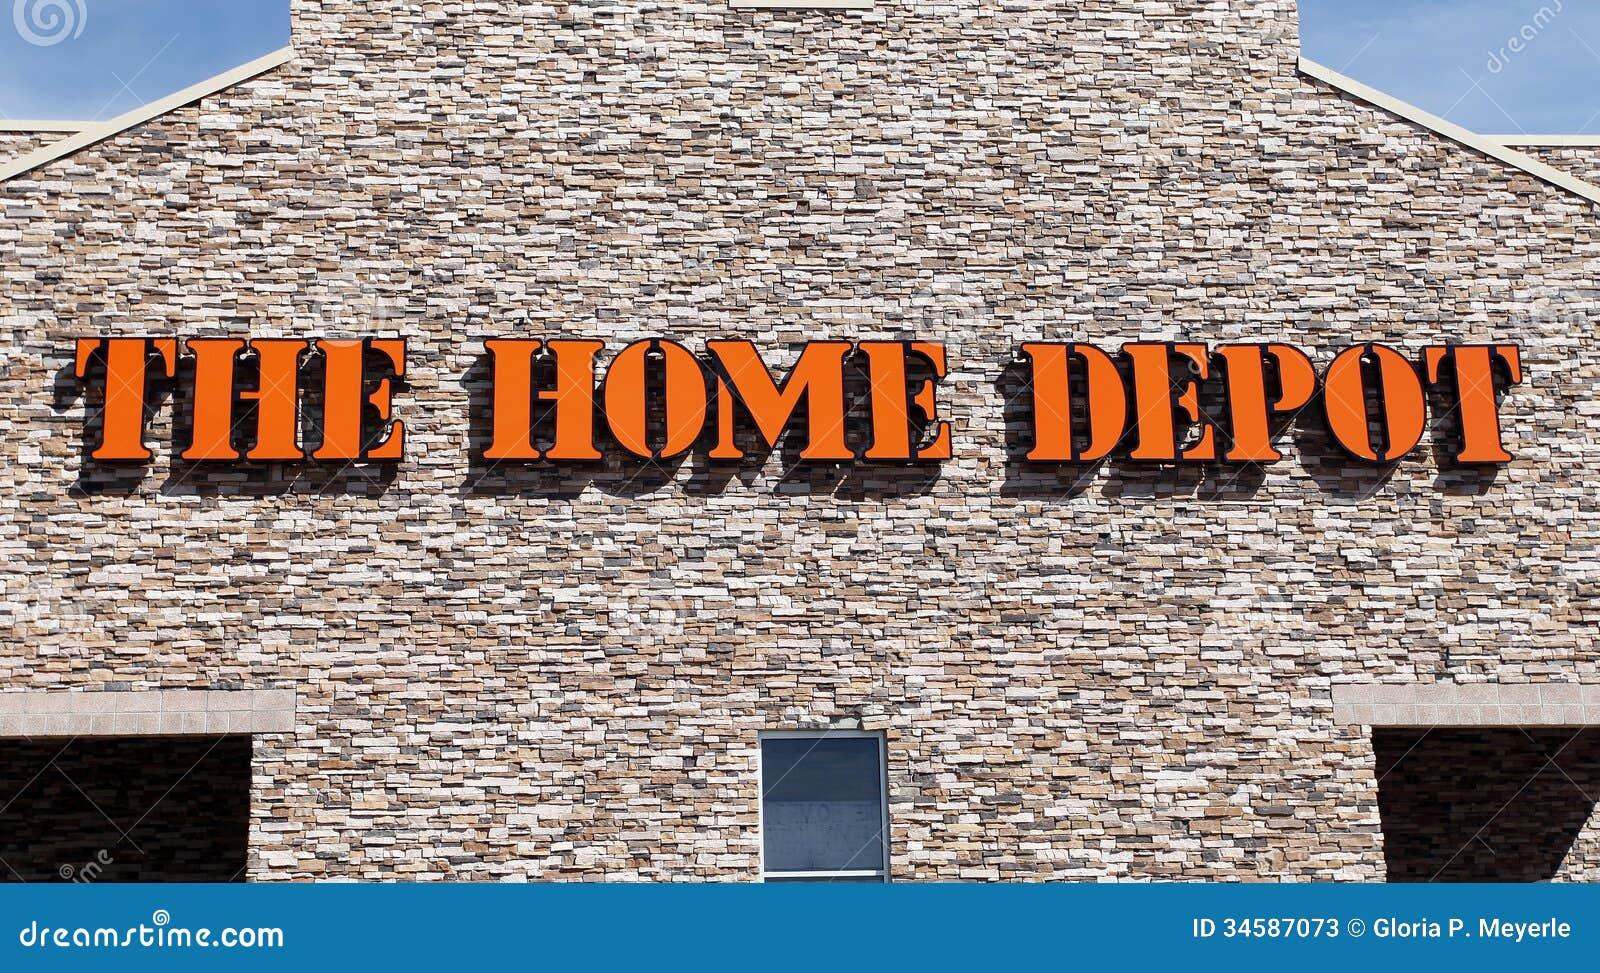 american home products American home products corp case solution,american home products corp case analysis, american home products corp case study solution, american home products is a company with little or no debt.